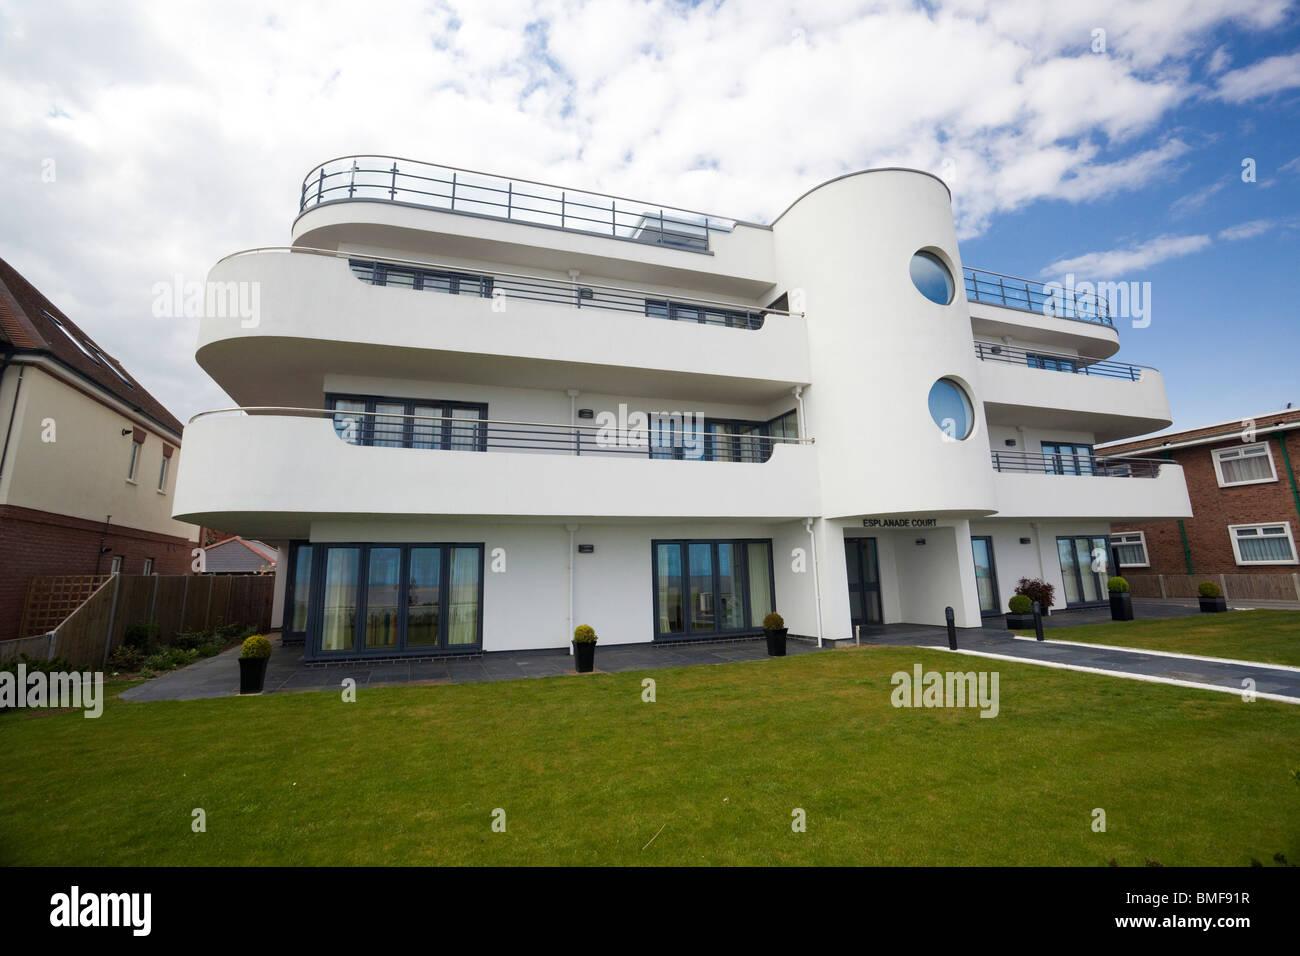 modern art deco style house at frinton on sea, essex, uk stock